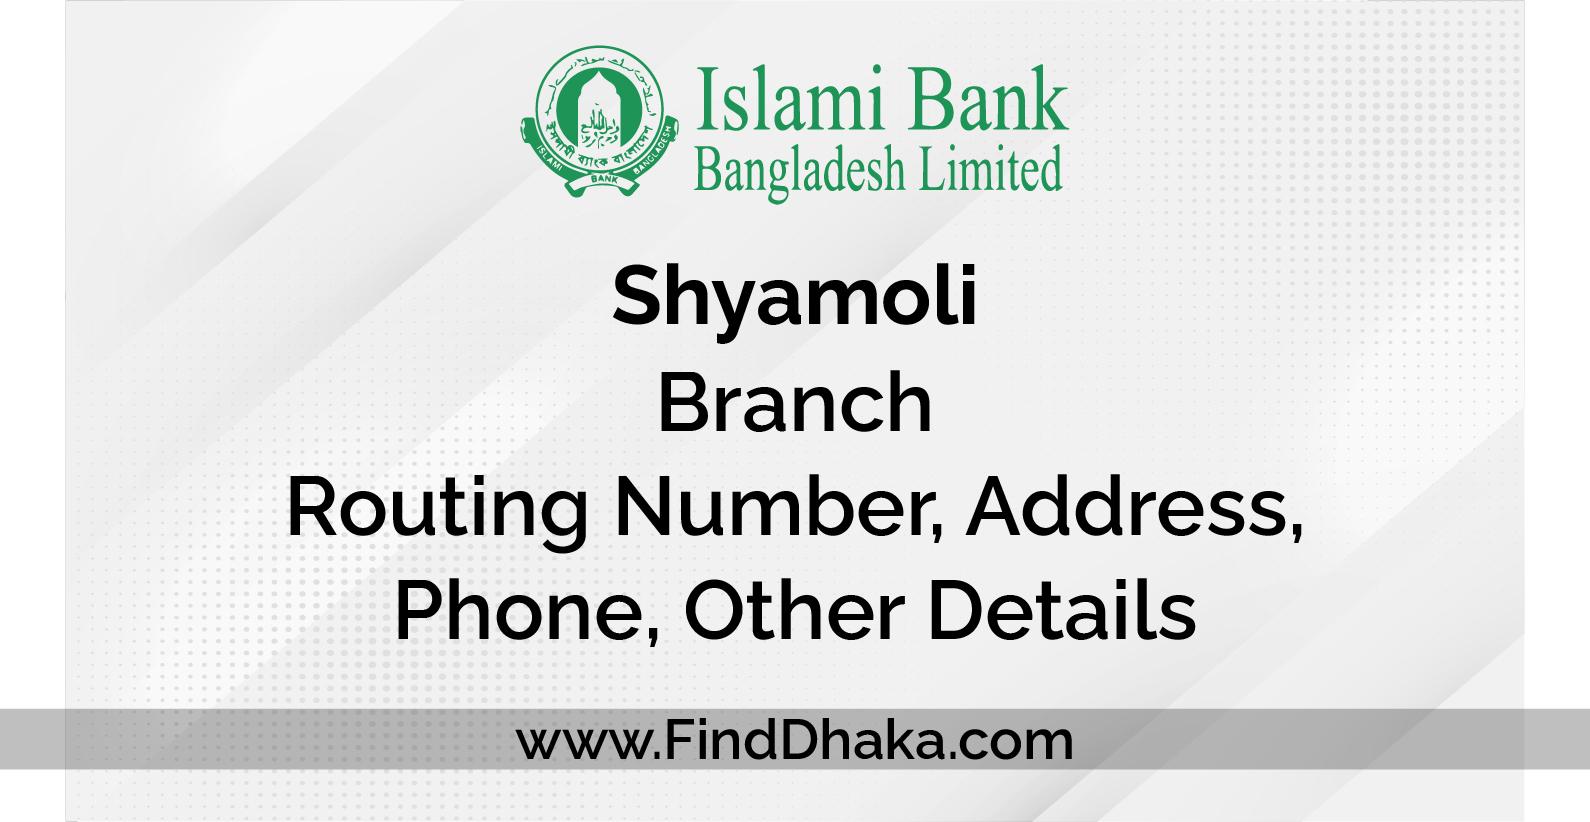 Islami Bank info002000 2